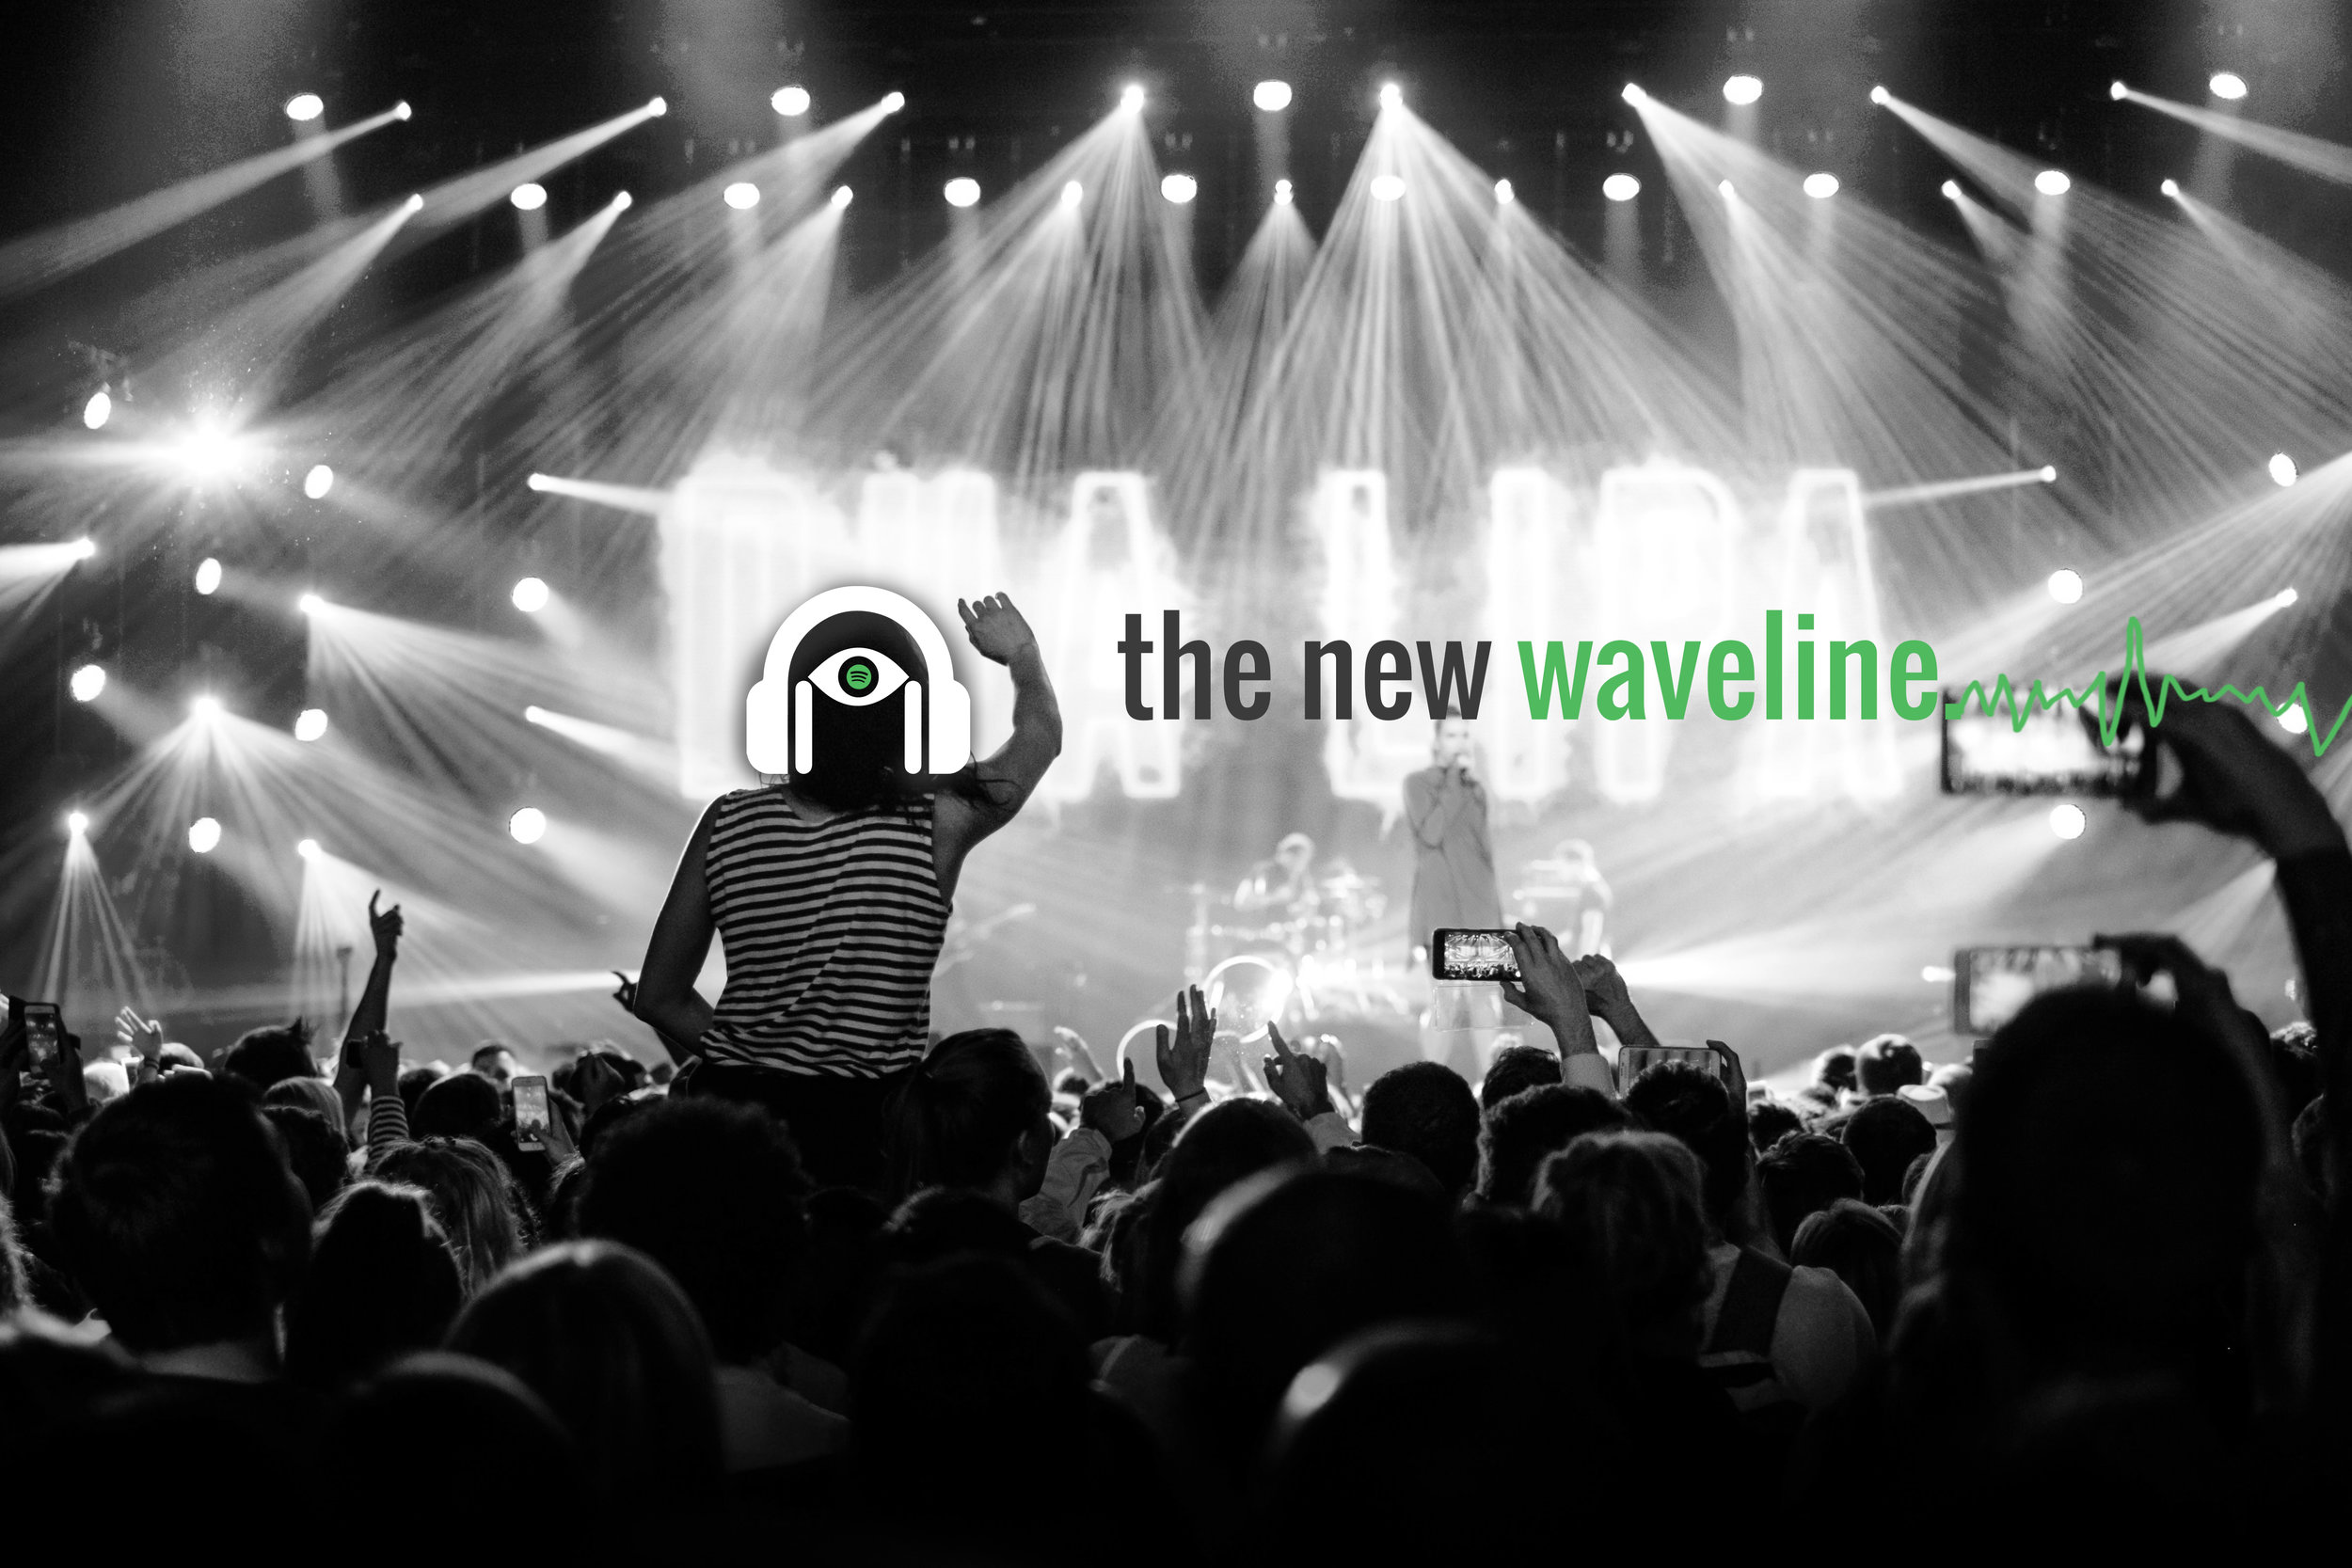 mel blanchard gong  spotify waveline as campaign.jpg